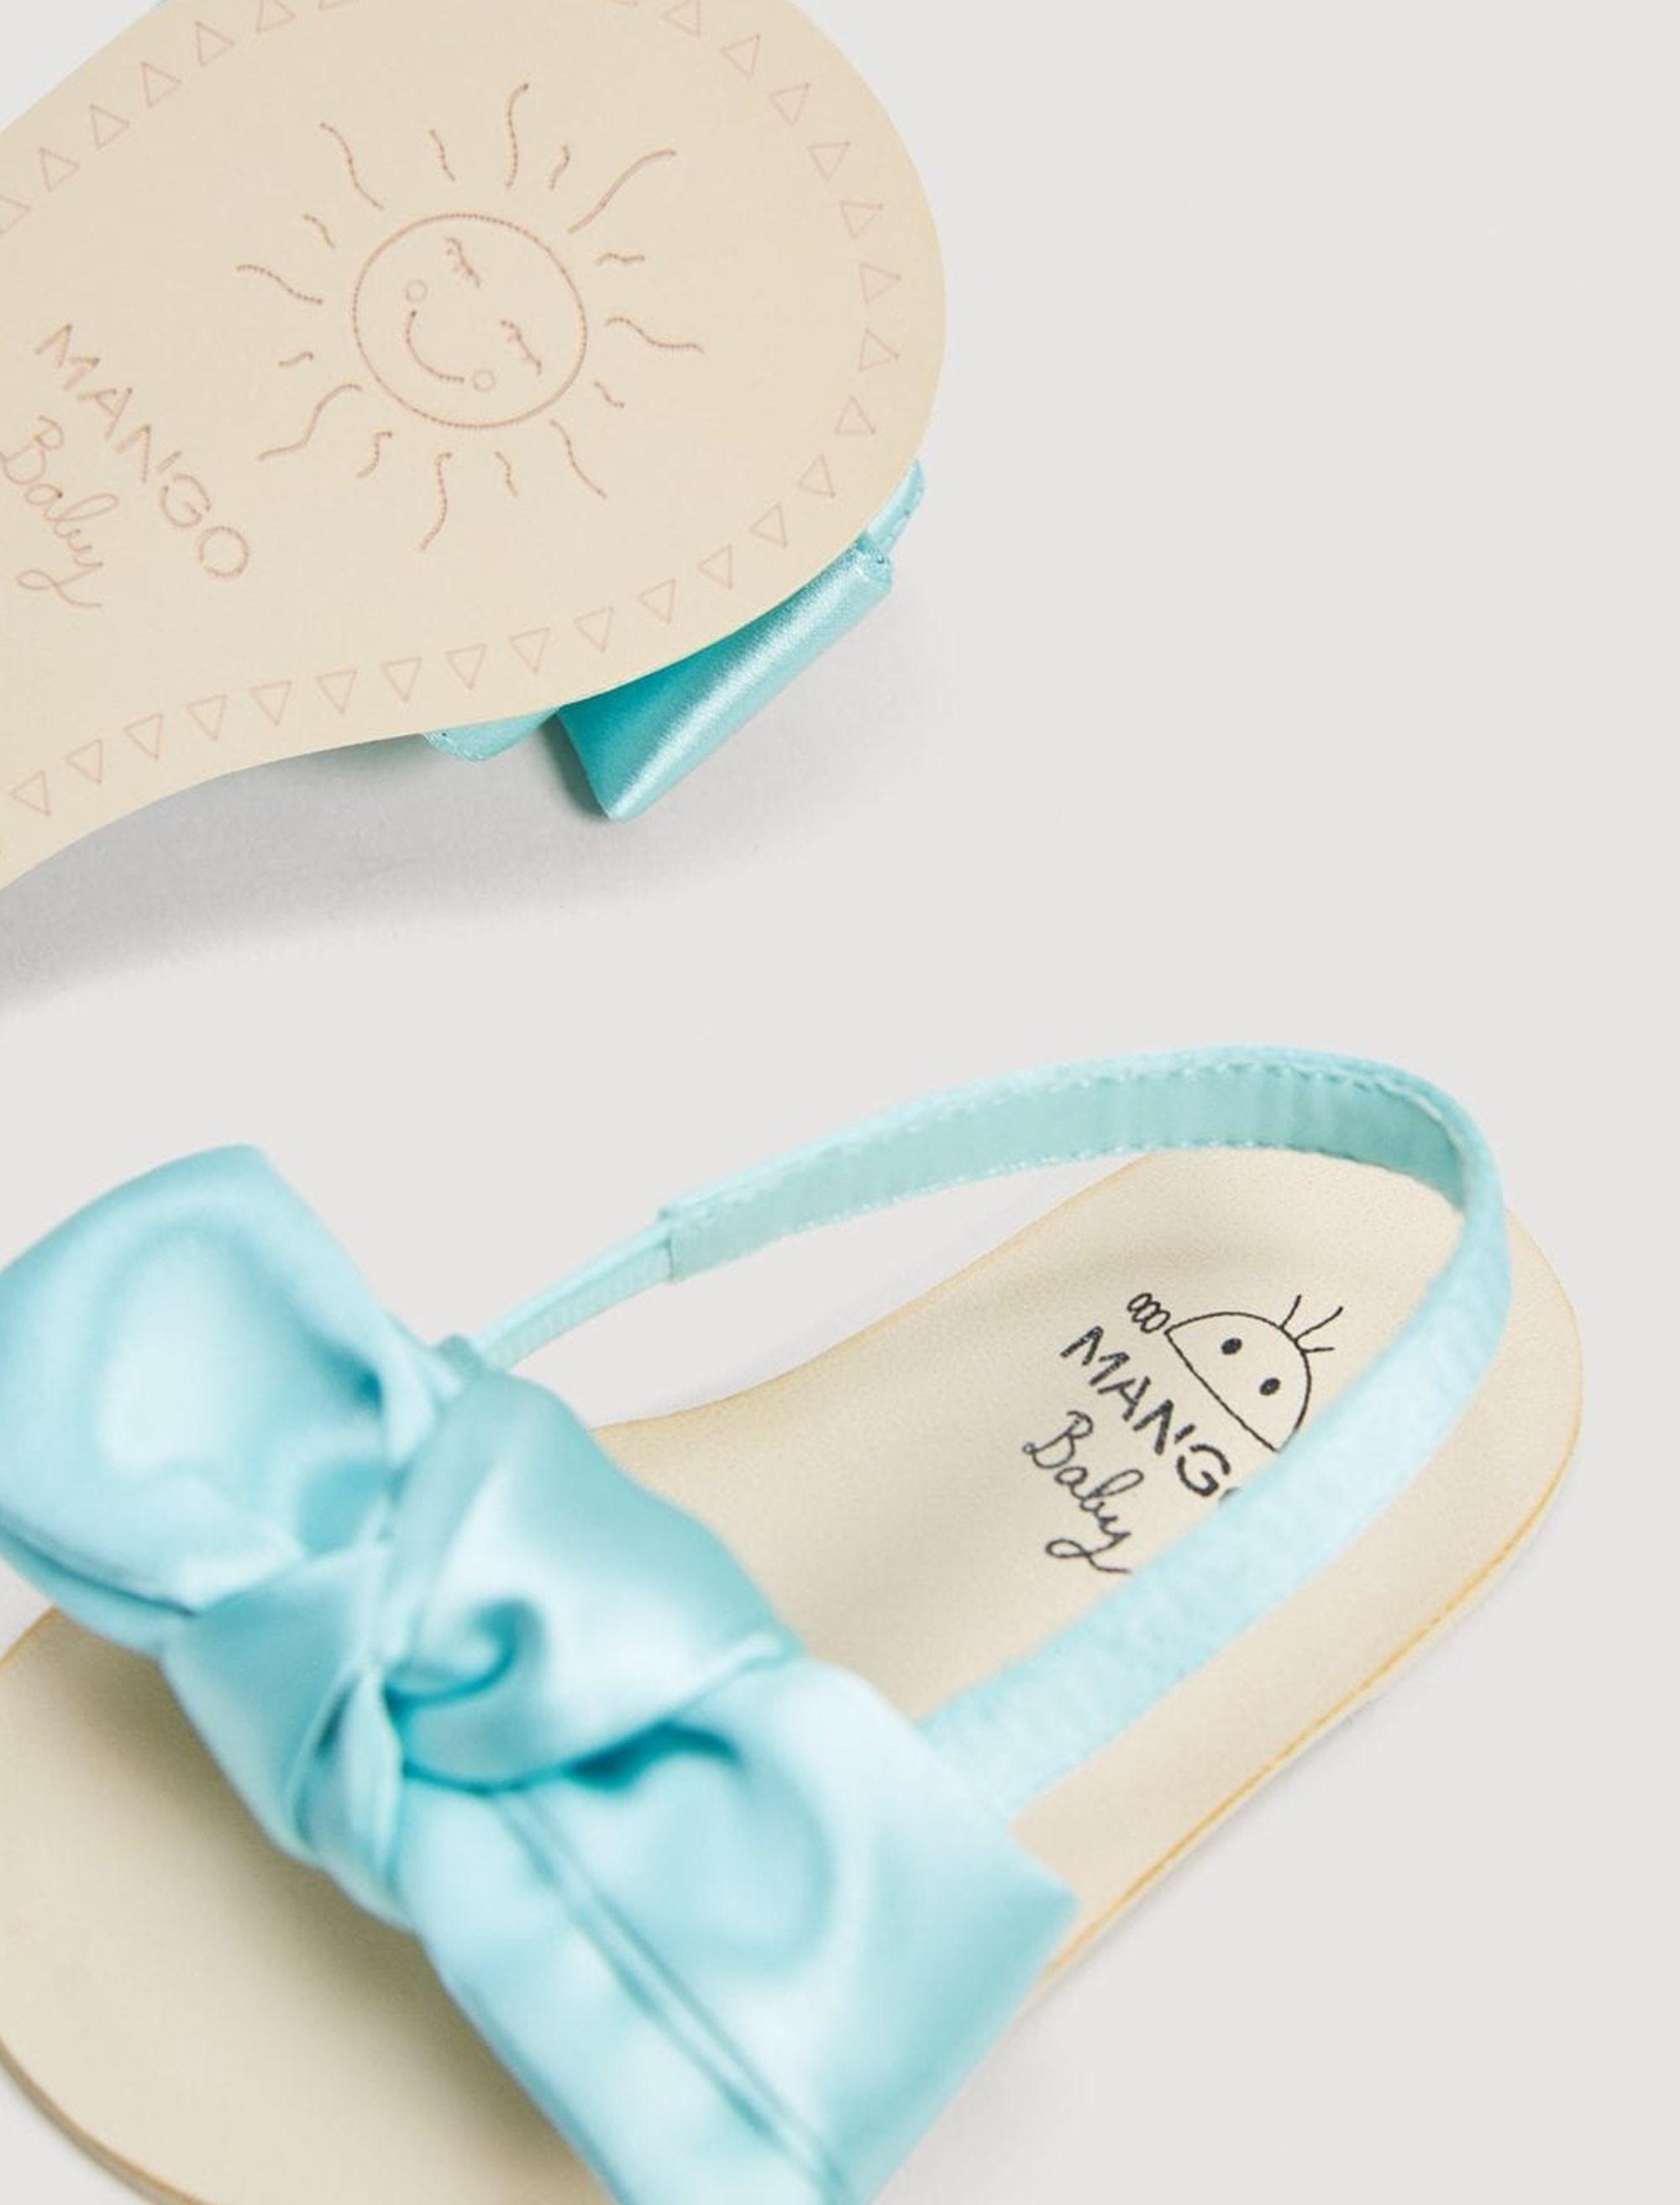 کفش بندی نوزادی دخترانه - مانگو - آبي روشن  - 5